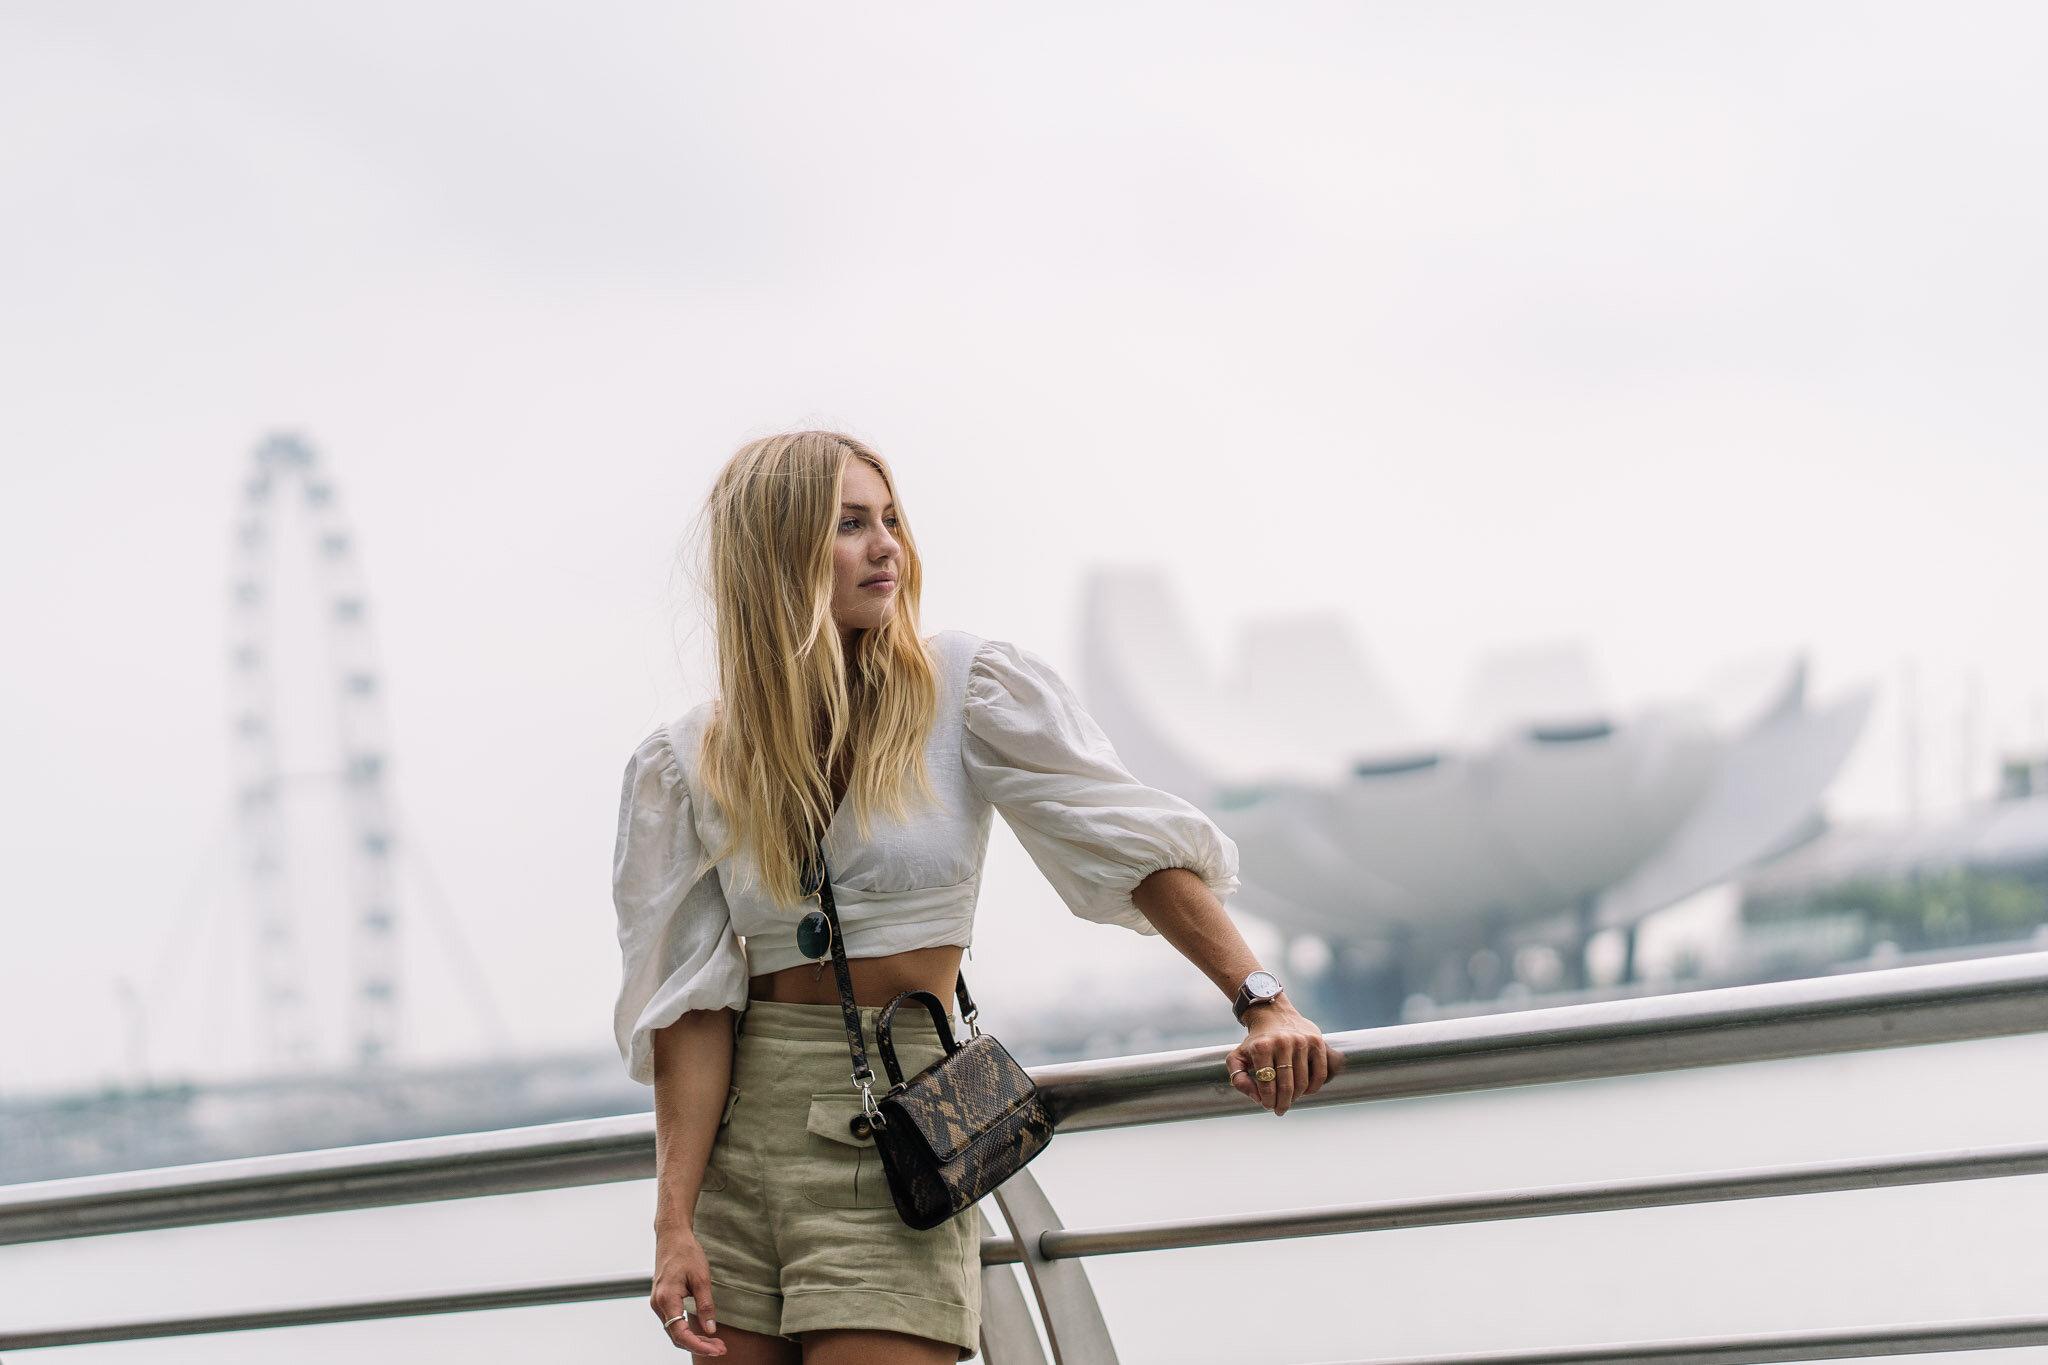 ELYSE KNOWLES TAG HEUER SINGAPORE GRAND PRIX 2019 2  6.jpg